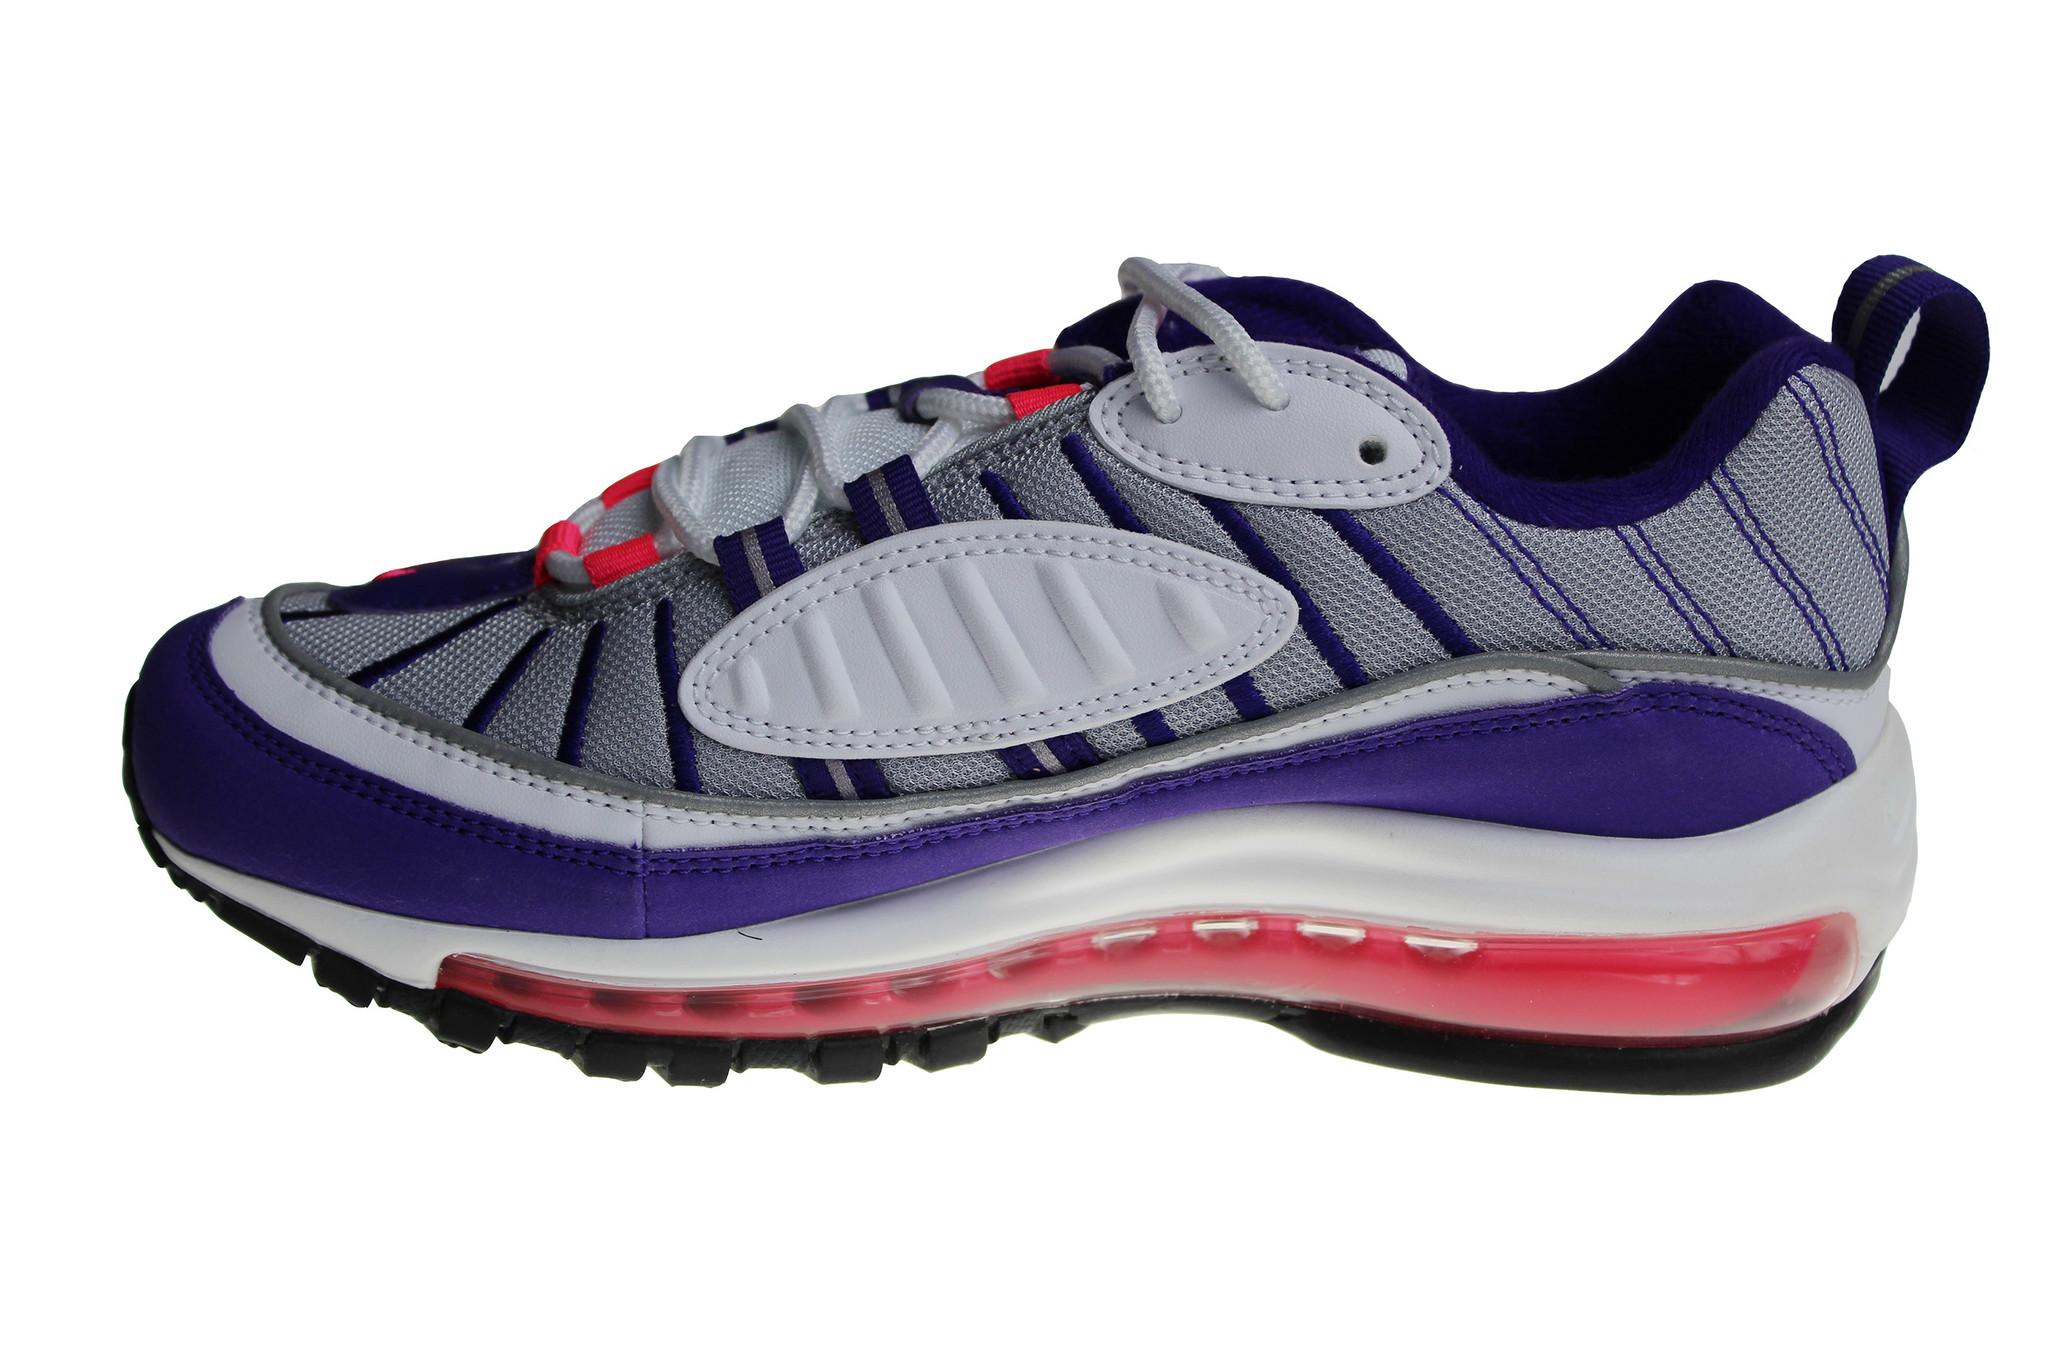 hot sale online ed8b9 a63cd Nike W Air Max 98 Pink/White/Blue/Grey AH6799 110 Women's Sneakers